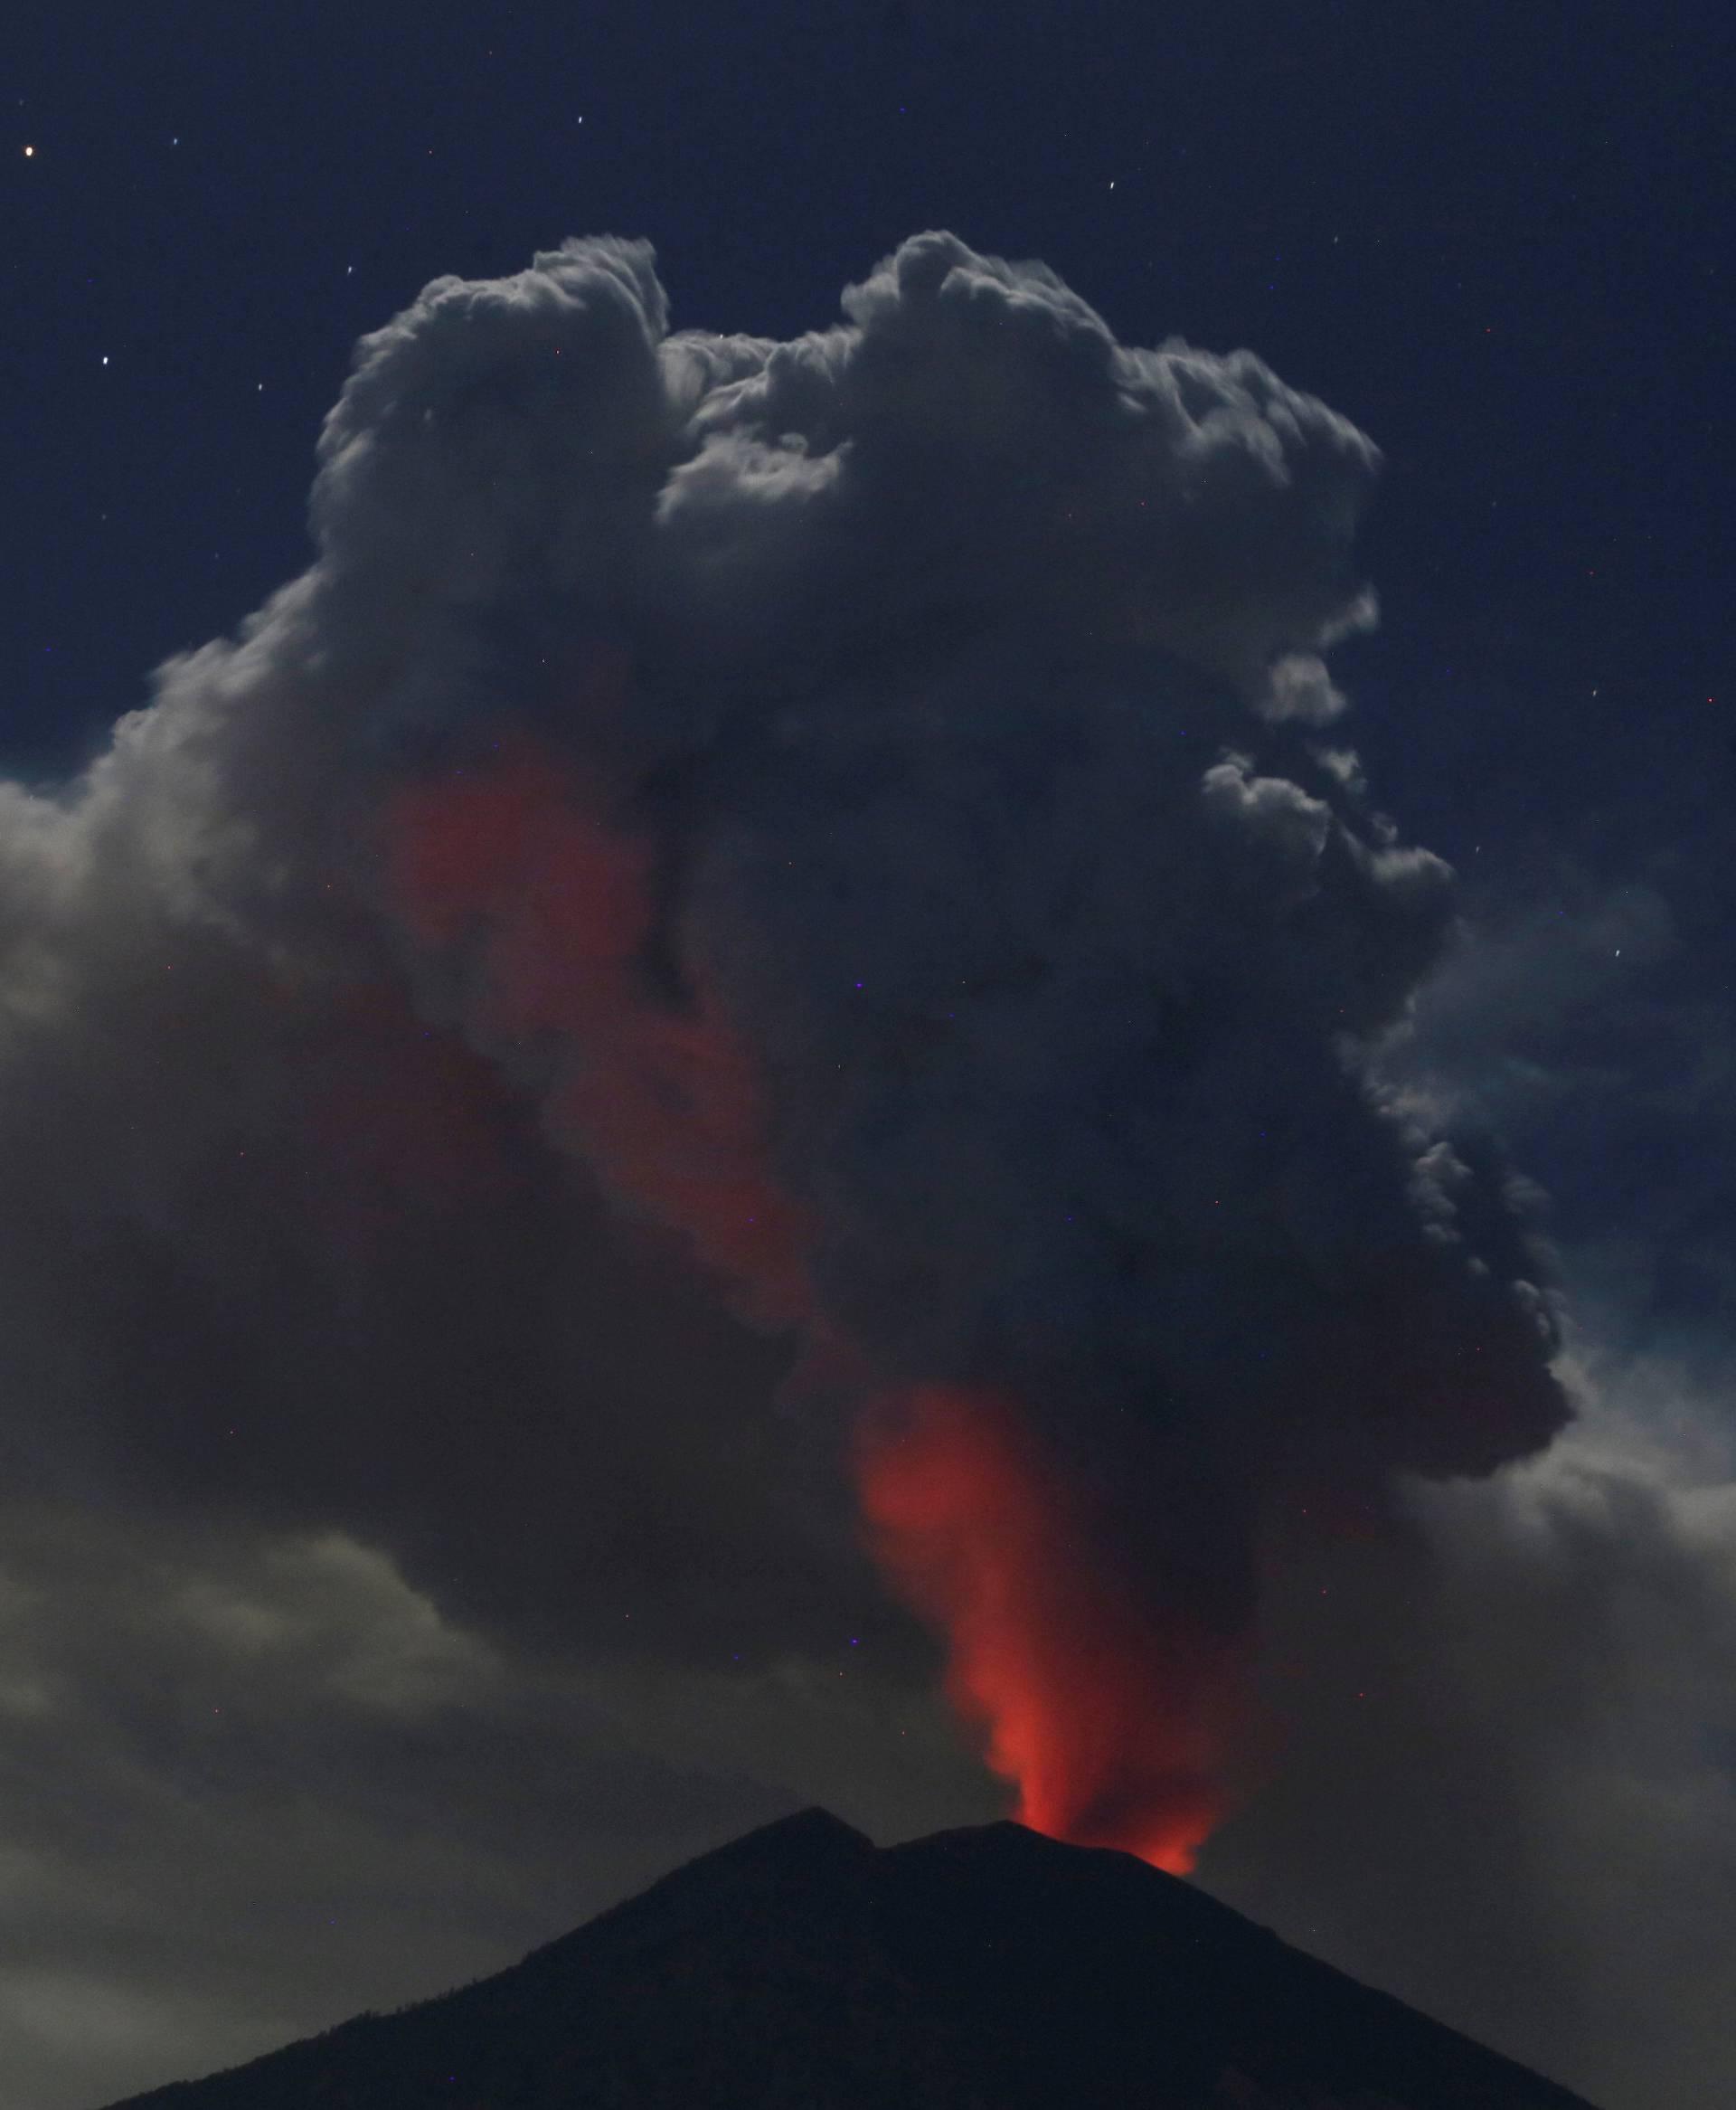 Mount Agung volcano erupts during the night, as seen from Datah village, Karangasem Regency in Bali